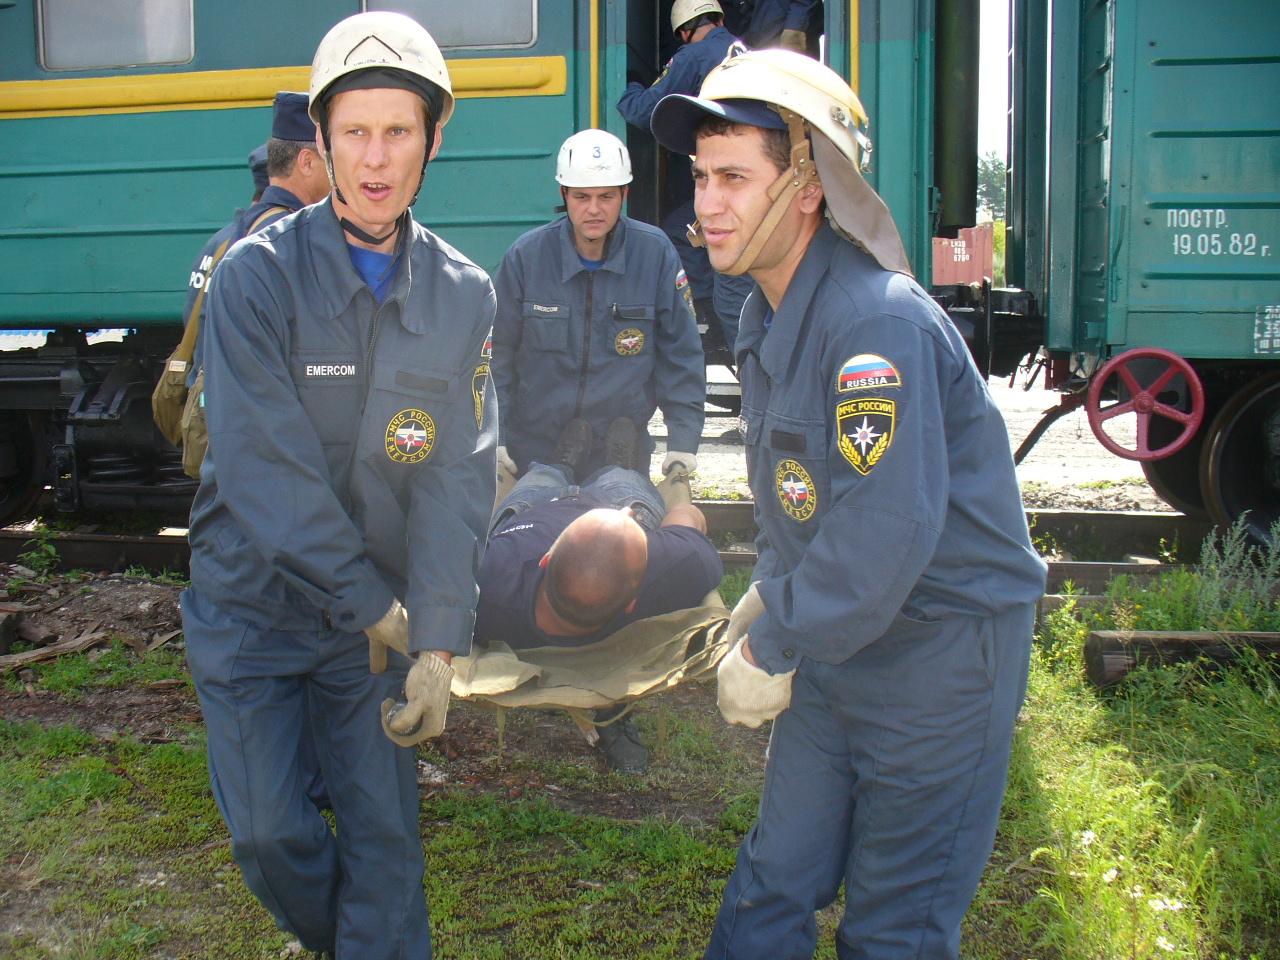 Спасатели помогли врачам Скорой помощи